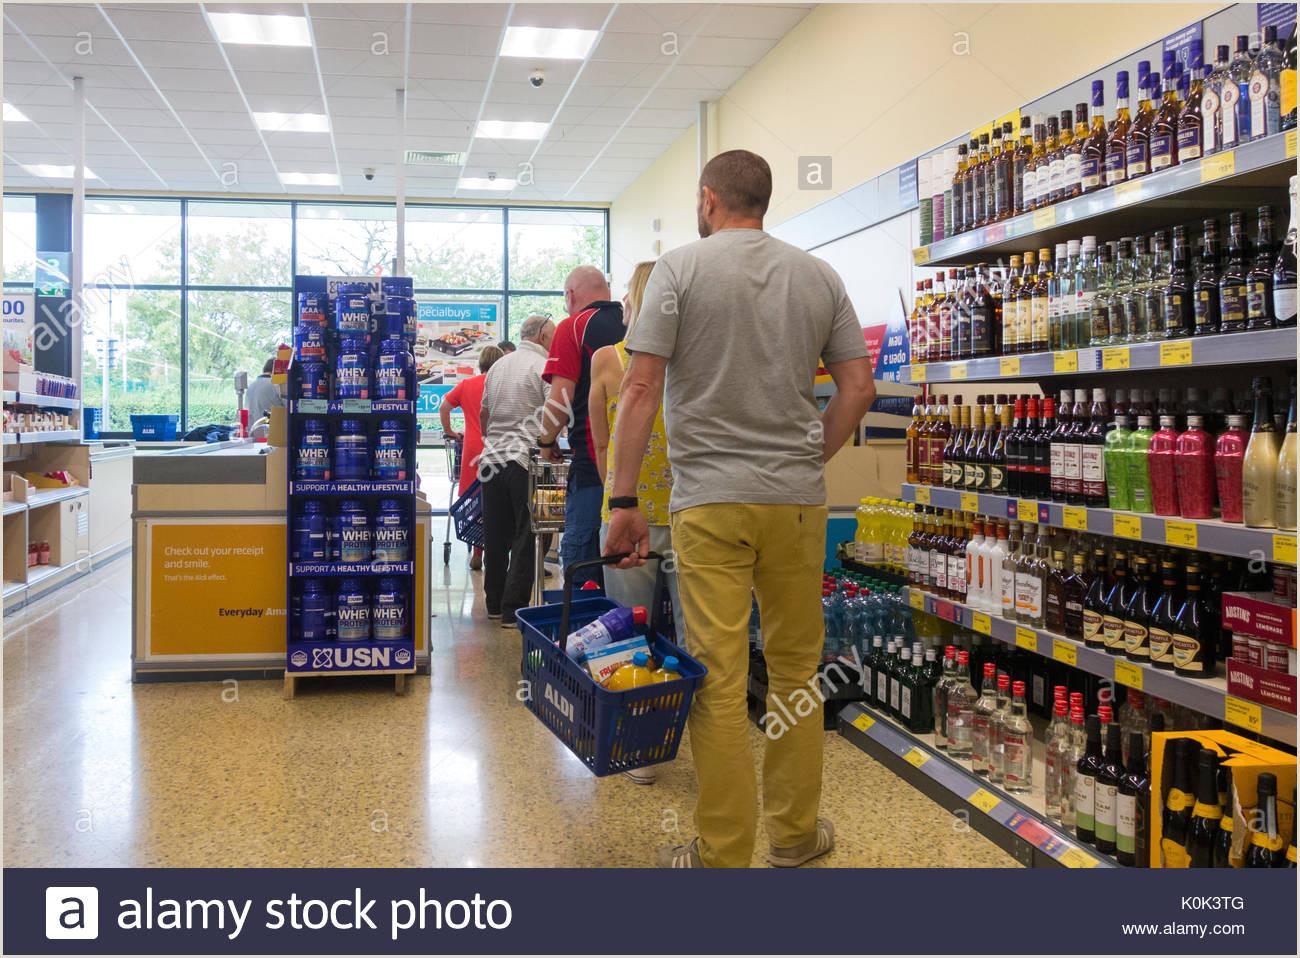 Aldi Supermarket Checkout s & Aldi Supermarket Checkout